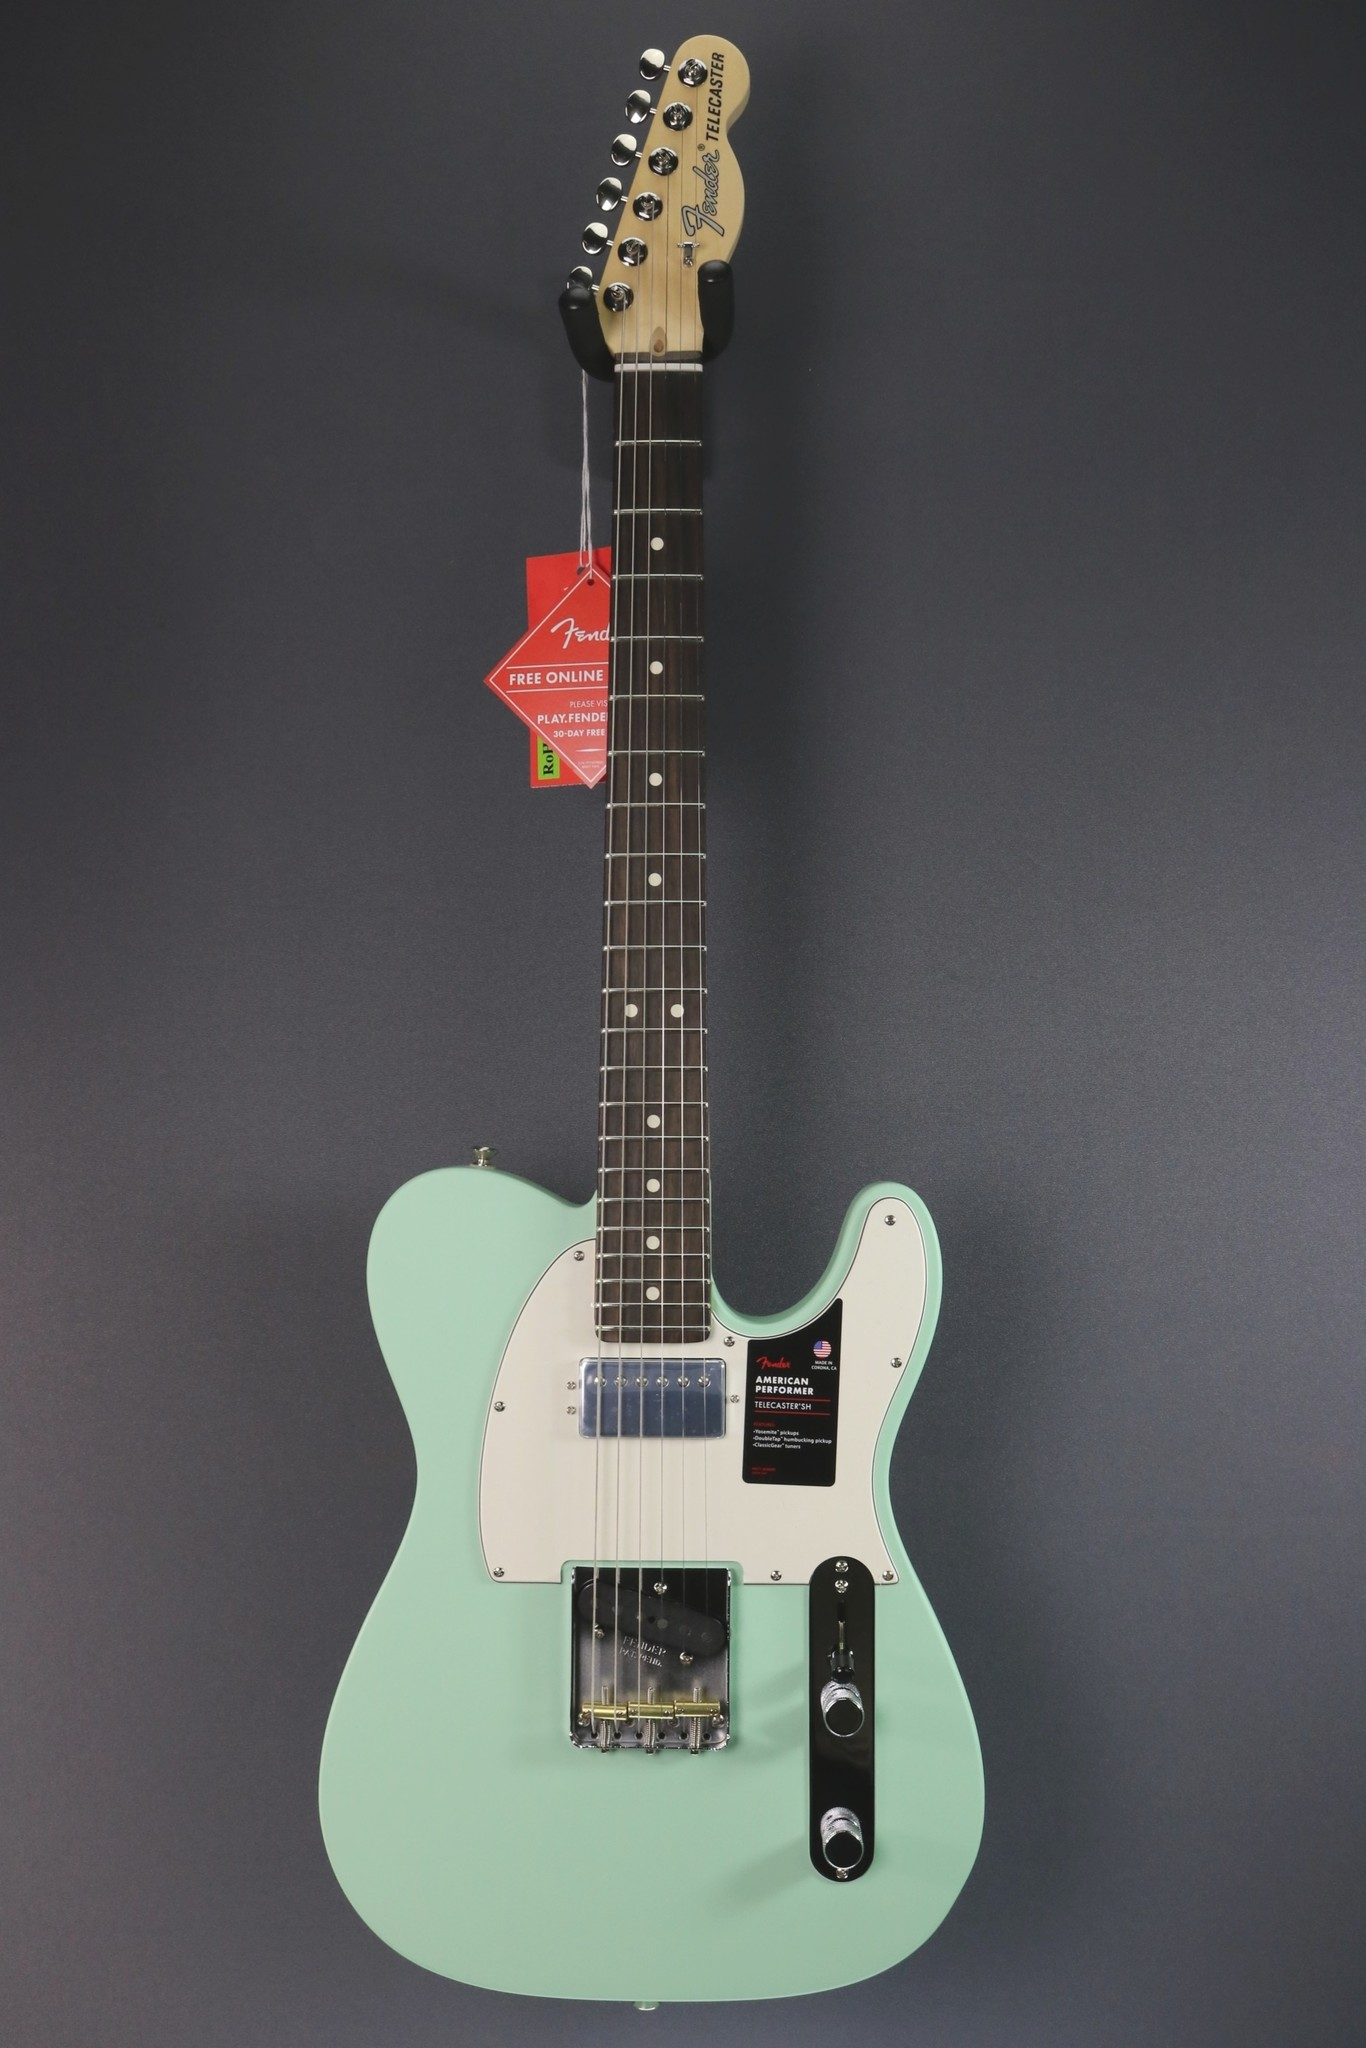 Fender DEMO Fender American Performer Telecaster Humbucker - Satin Surf Green (205)